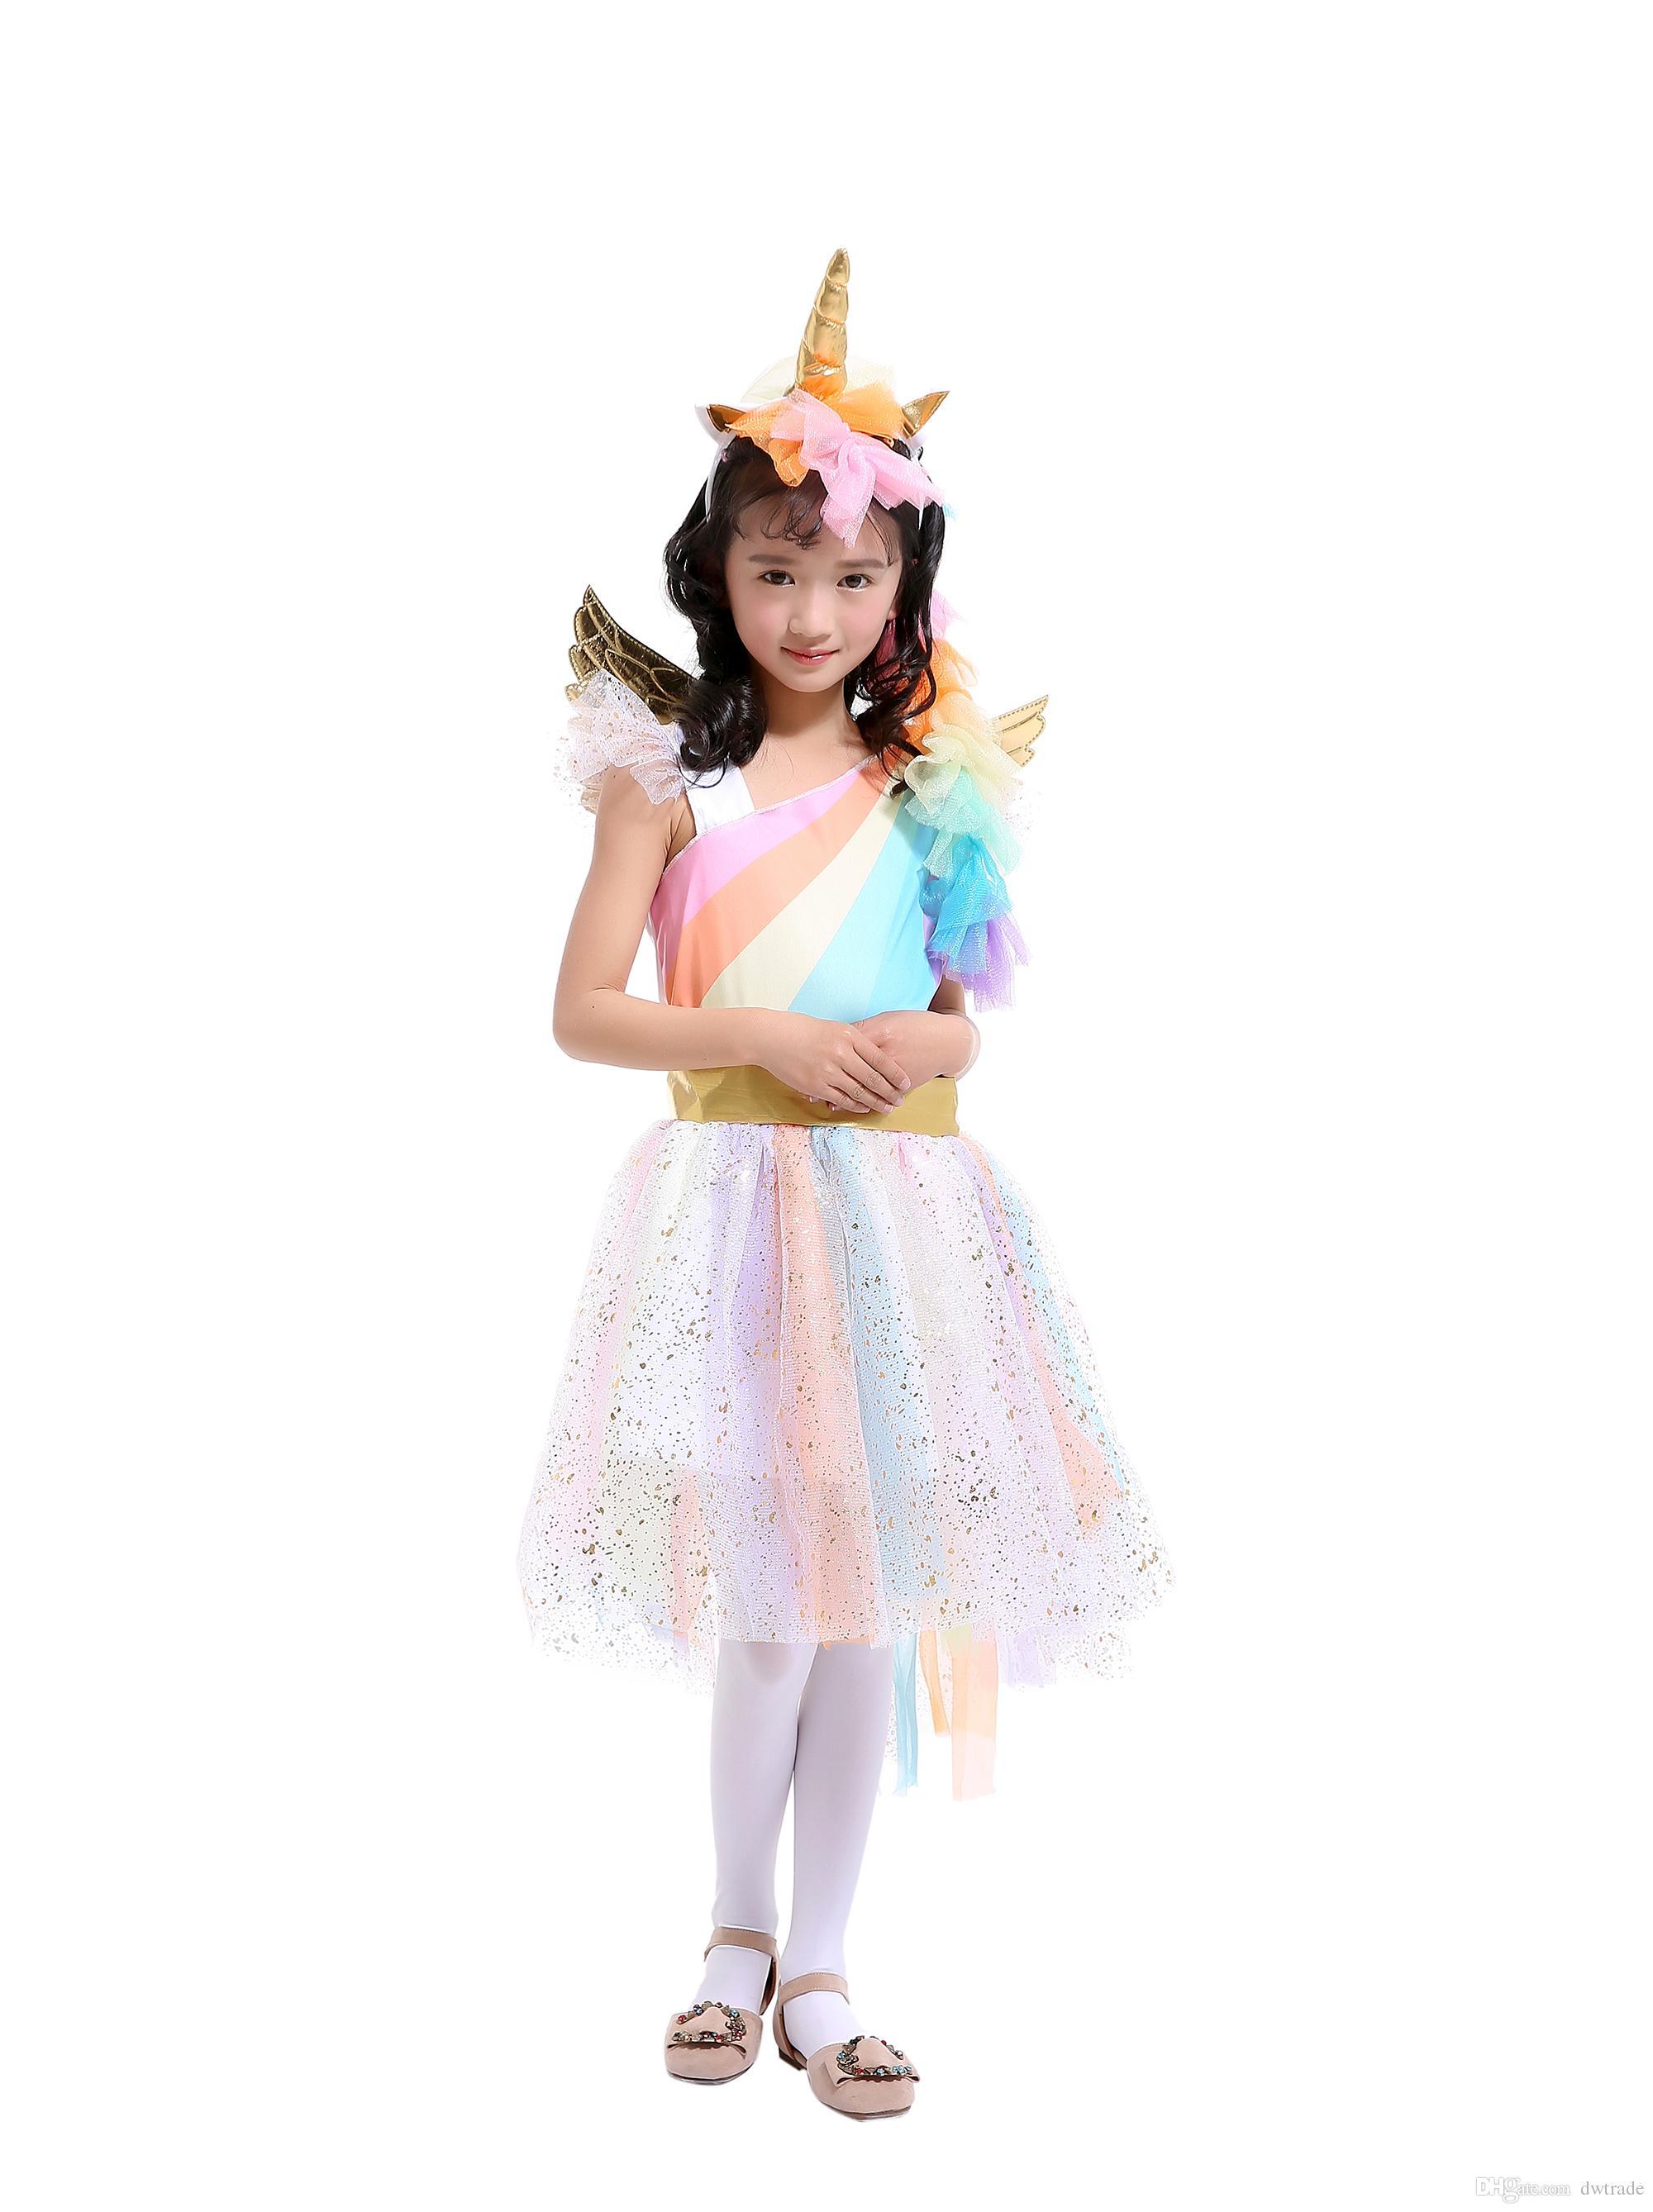 Unicorn Rainbow Color Princess Tutu Dress Suits with 1 Unicorn Corn Headband+1 Golden Wings Cosplay Clothing Girls Stage Performance Dresses